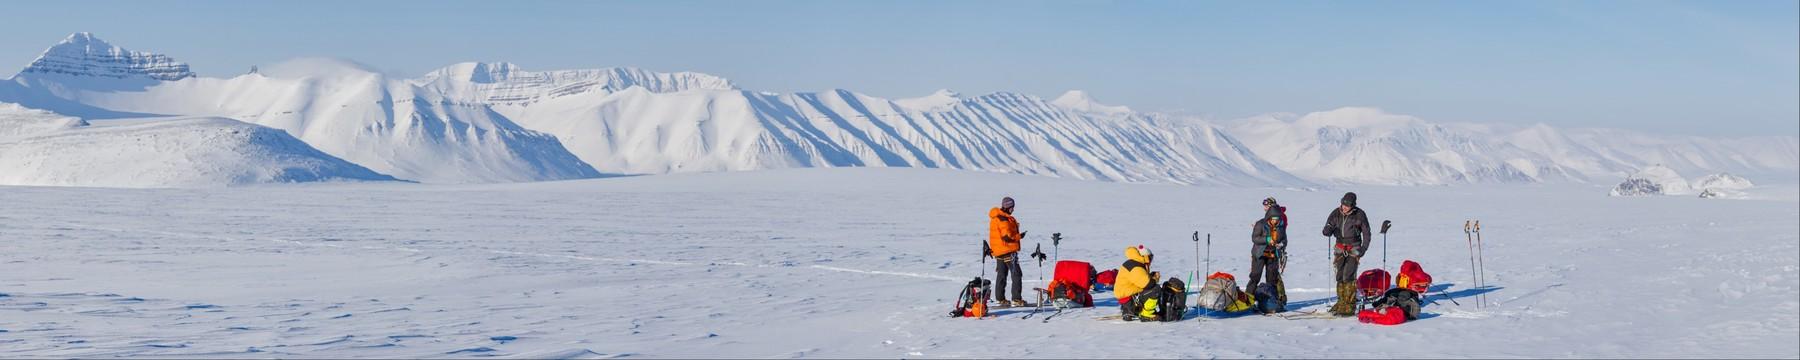 Winter ski expedition on glacier